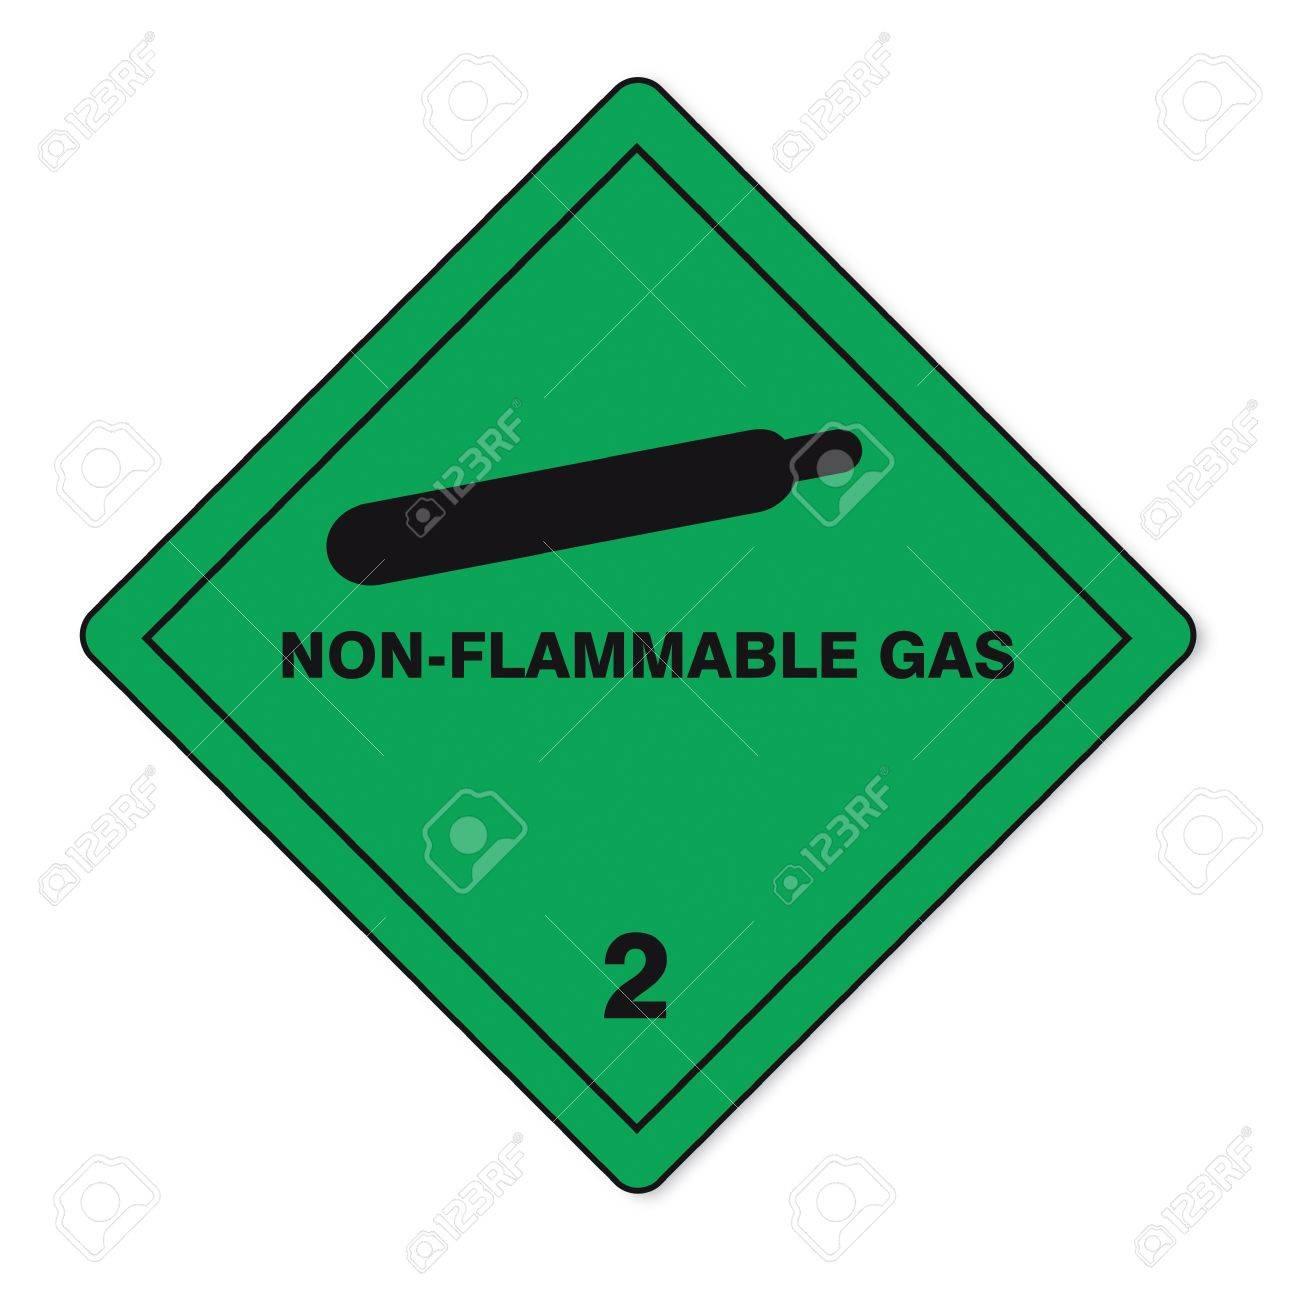 Hazardous substances signs icon flammable skull radioactive fire gas Stock Vector - 14380138